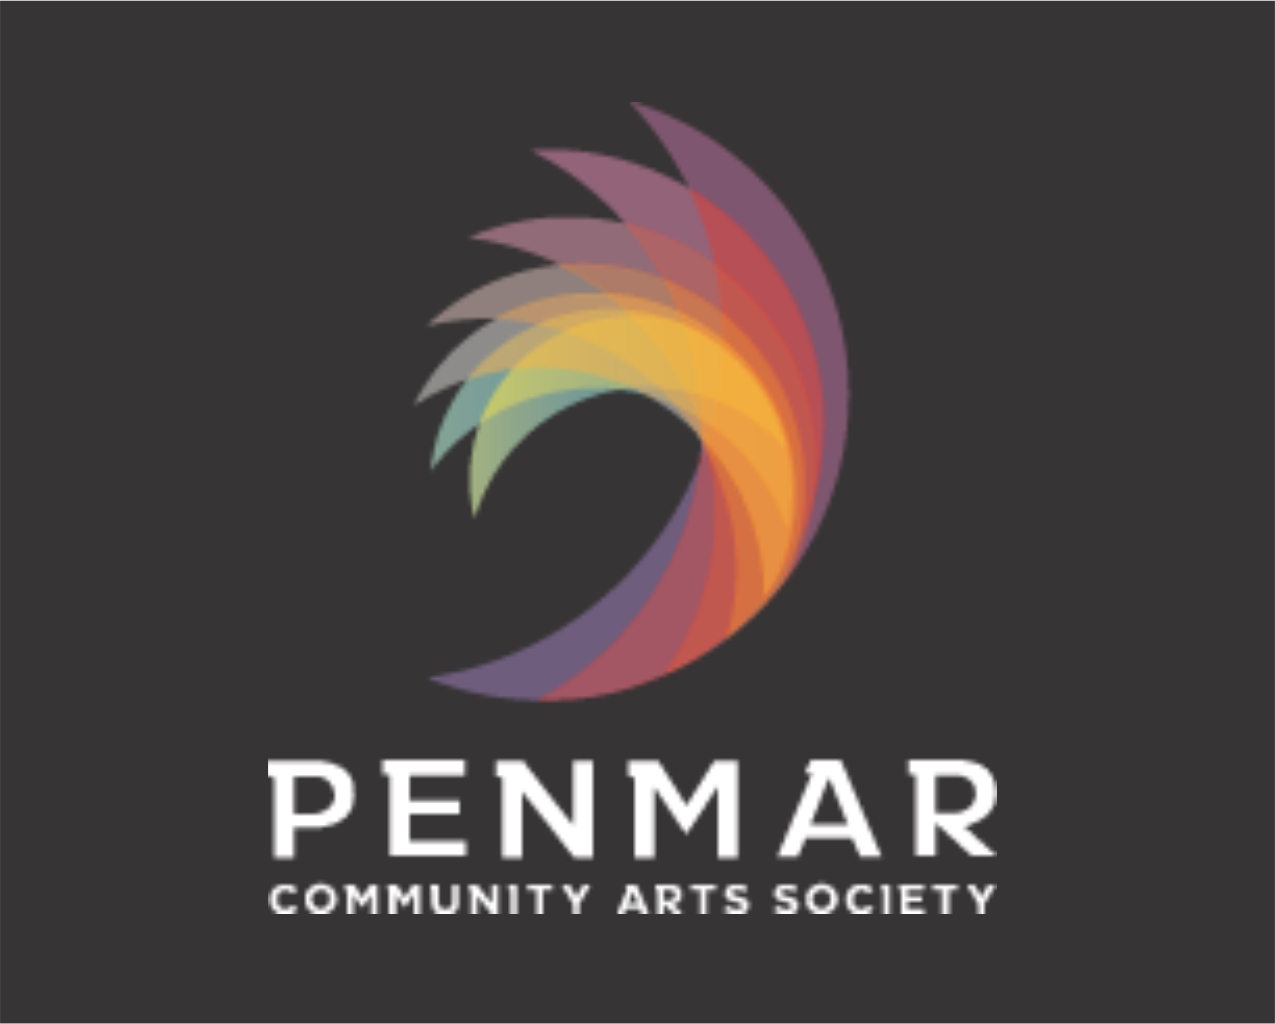 Penmar Community Arts Society Logo